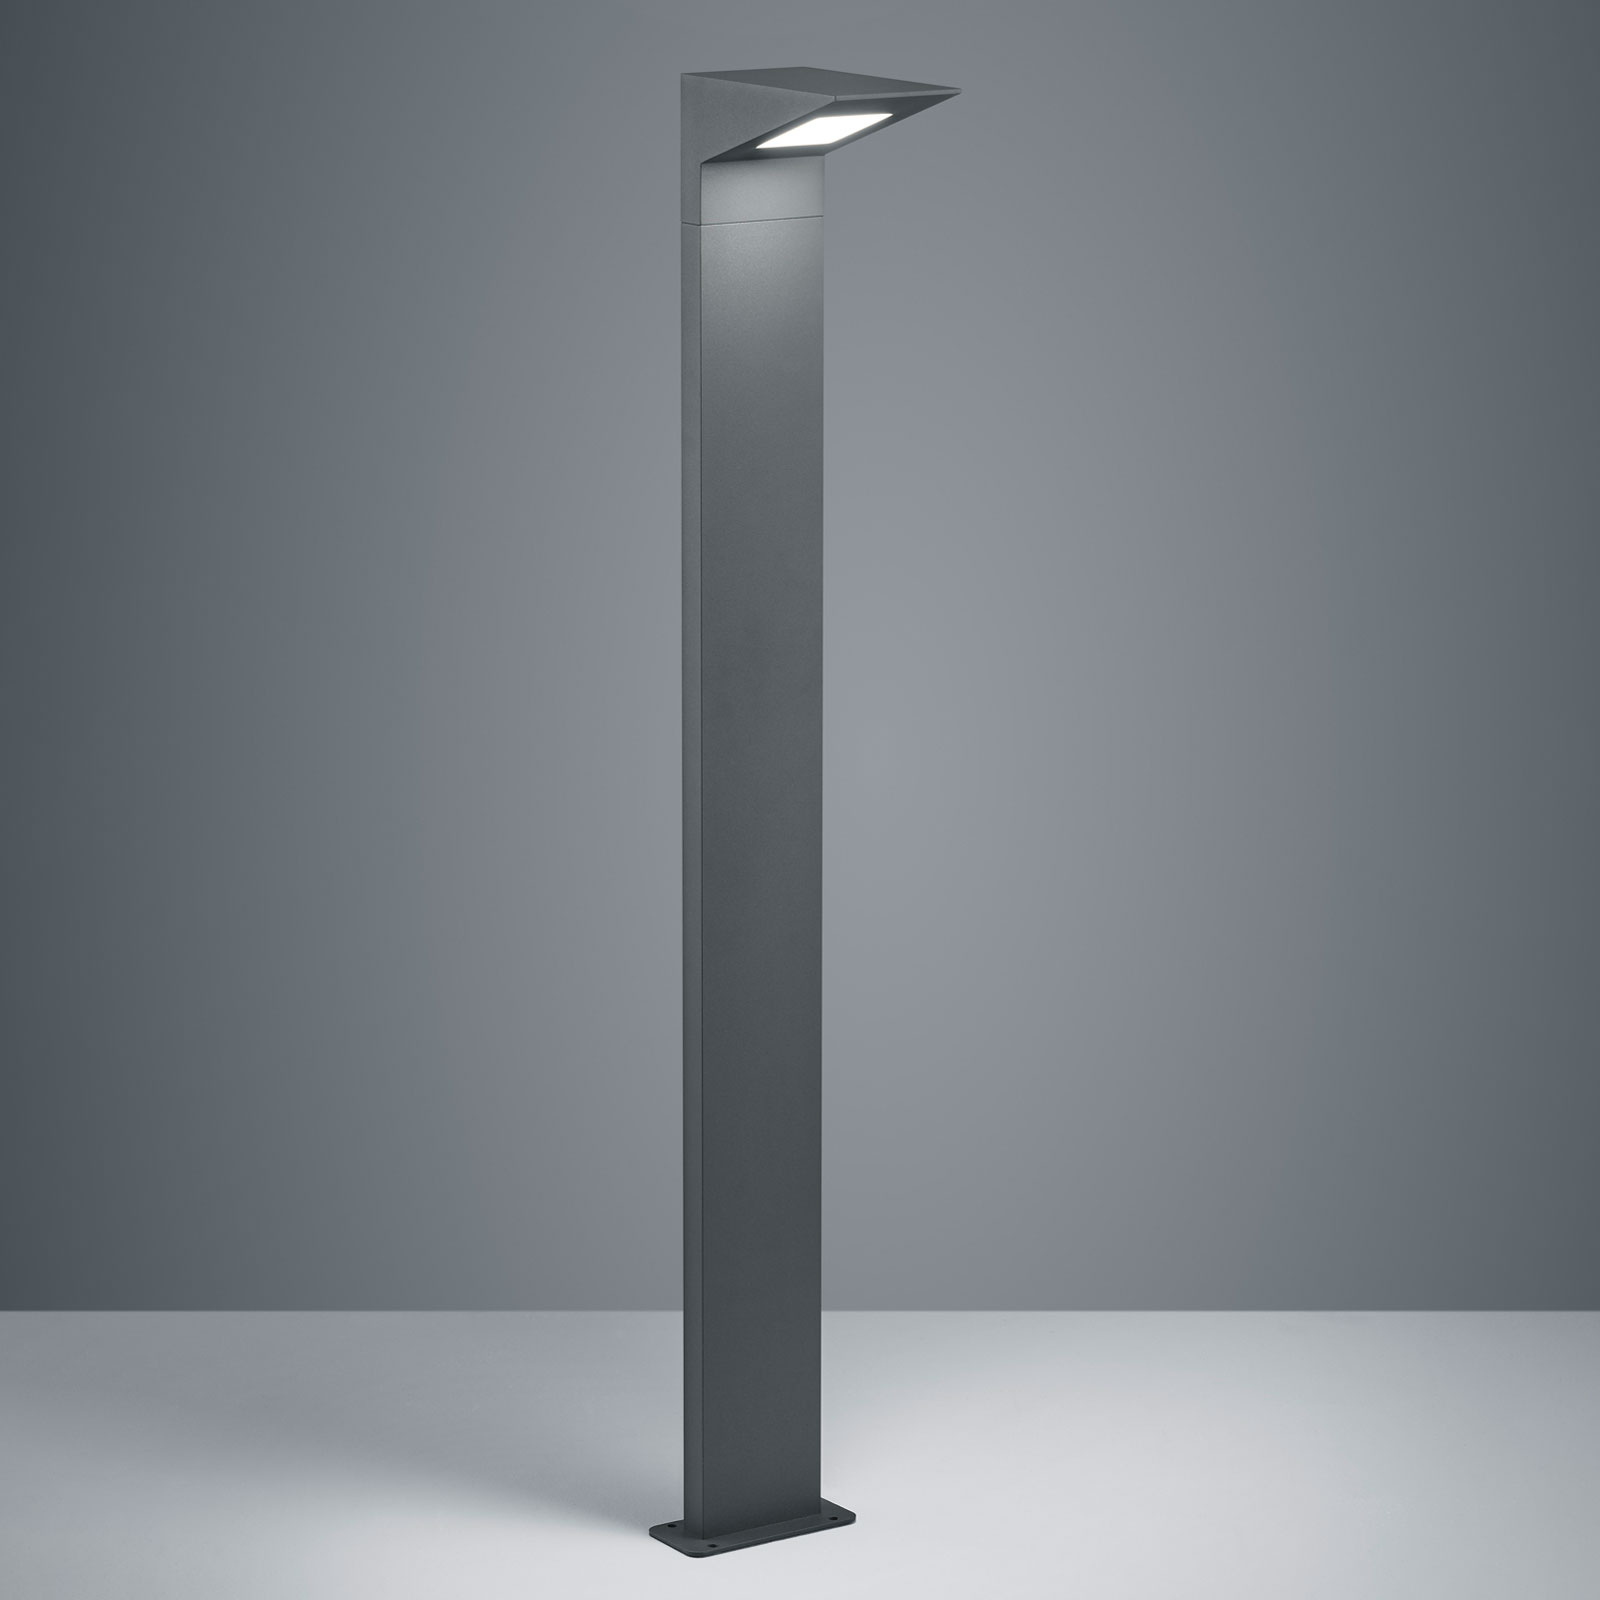 LED-Wegeleuchte Nelson, Höhe 100 cm